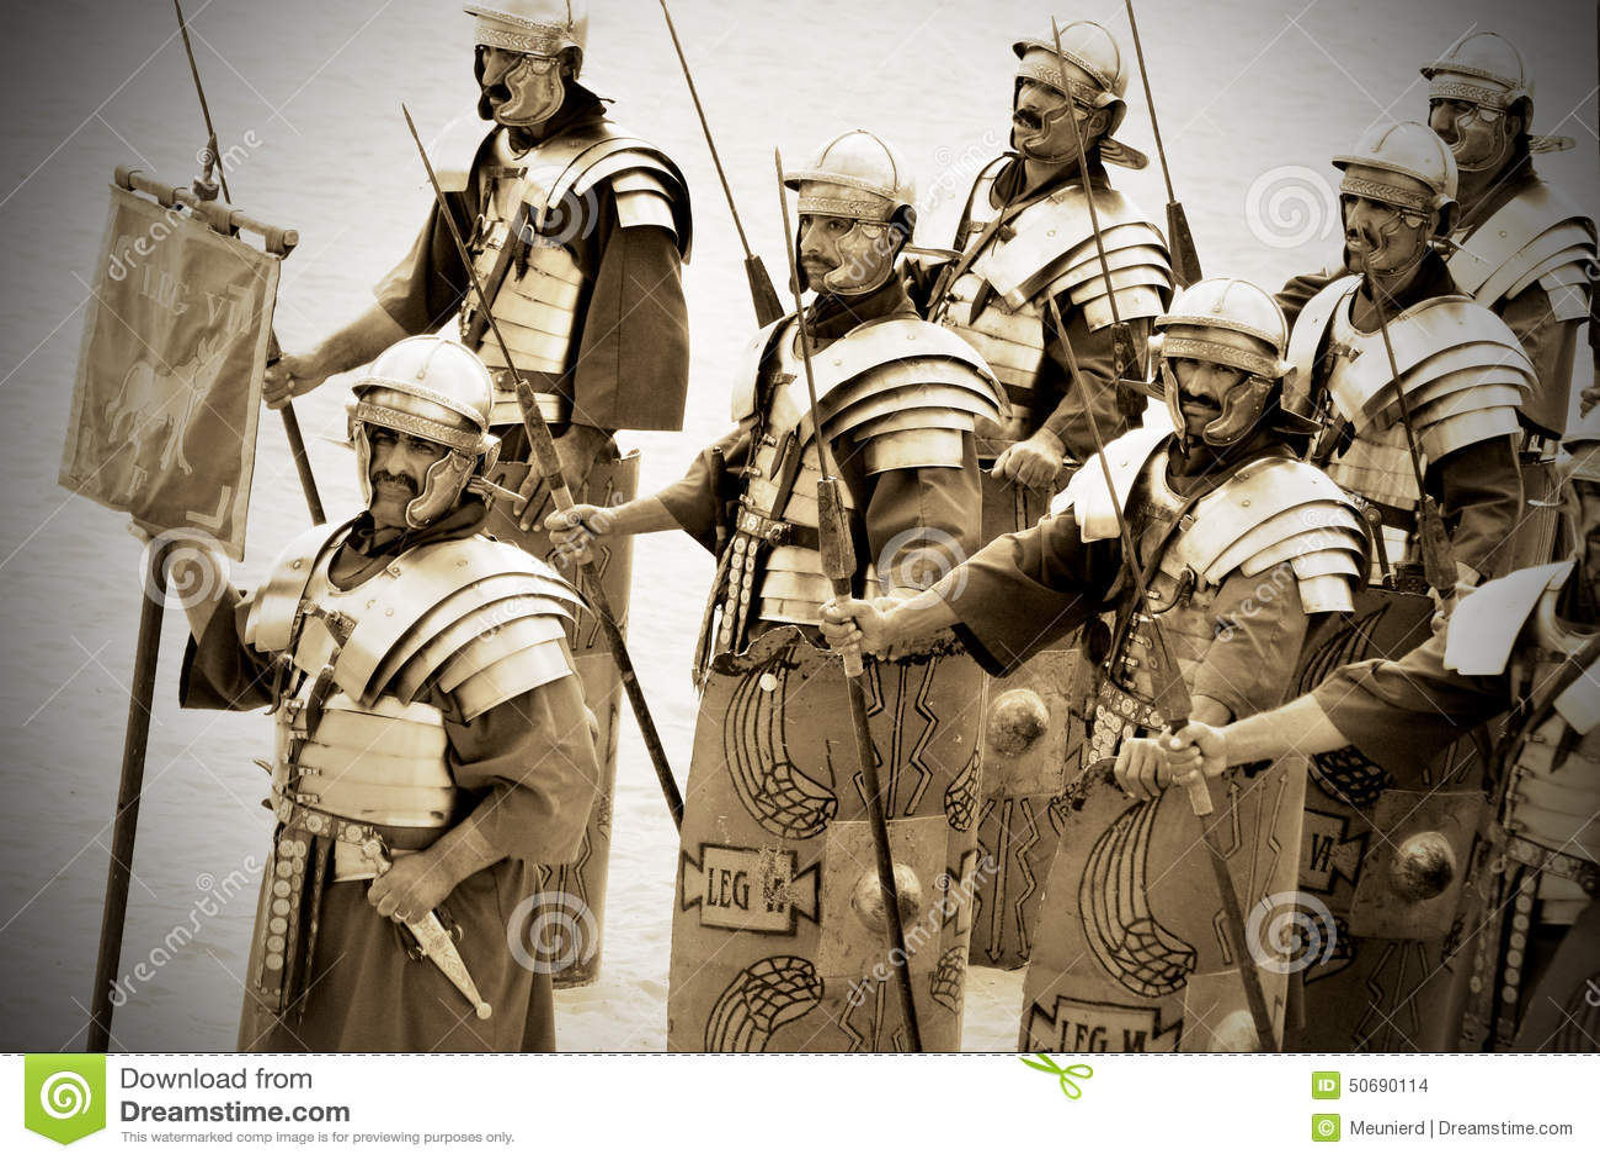 Download 作为罗马战士的约旦人礼服 编辑类库存图片. 图片 包括有 通用, 活动, 例证, 帝国, 方式, 智能, 百人队队长 - 50690114